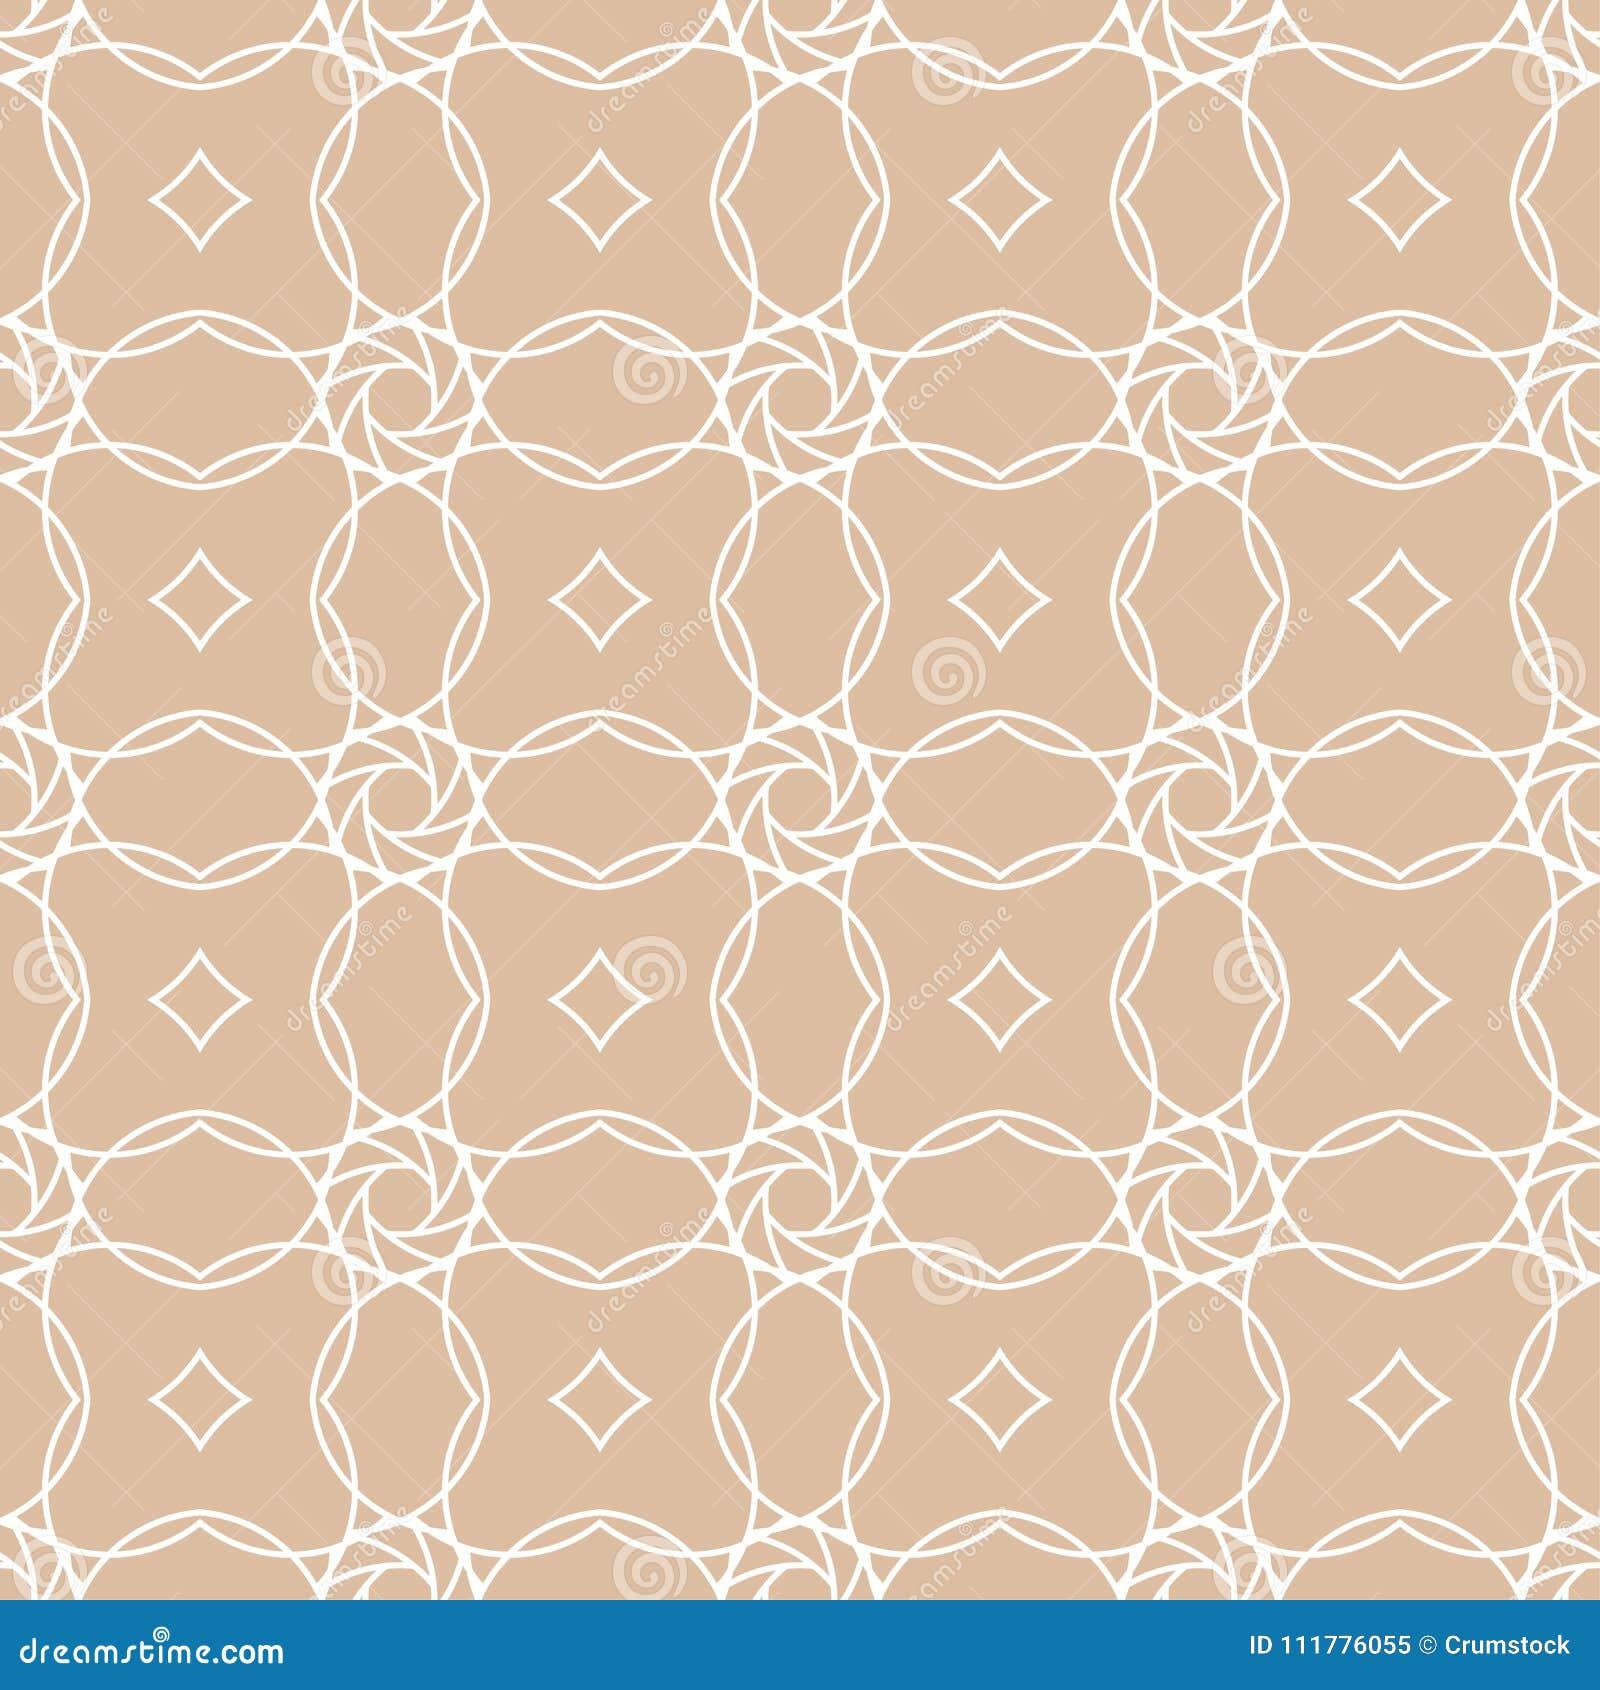 Beige and white geometric ornament. Seamless pattern